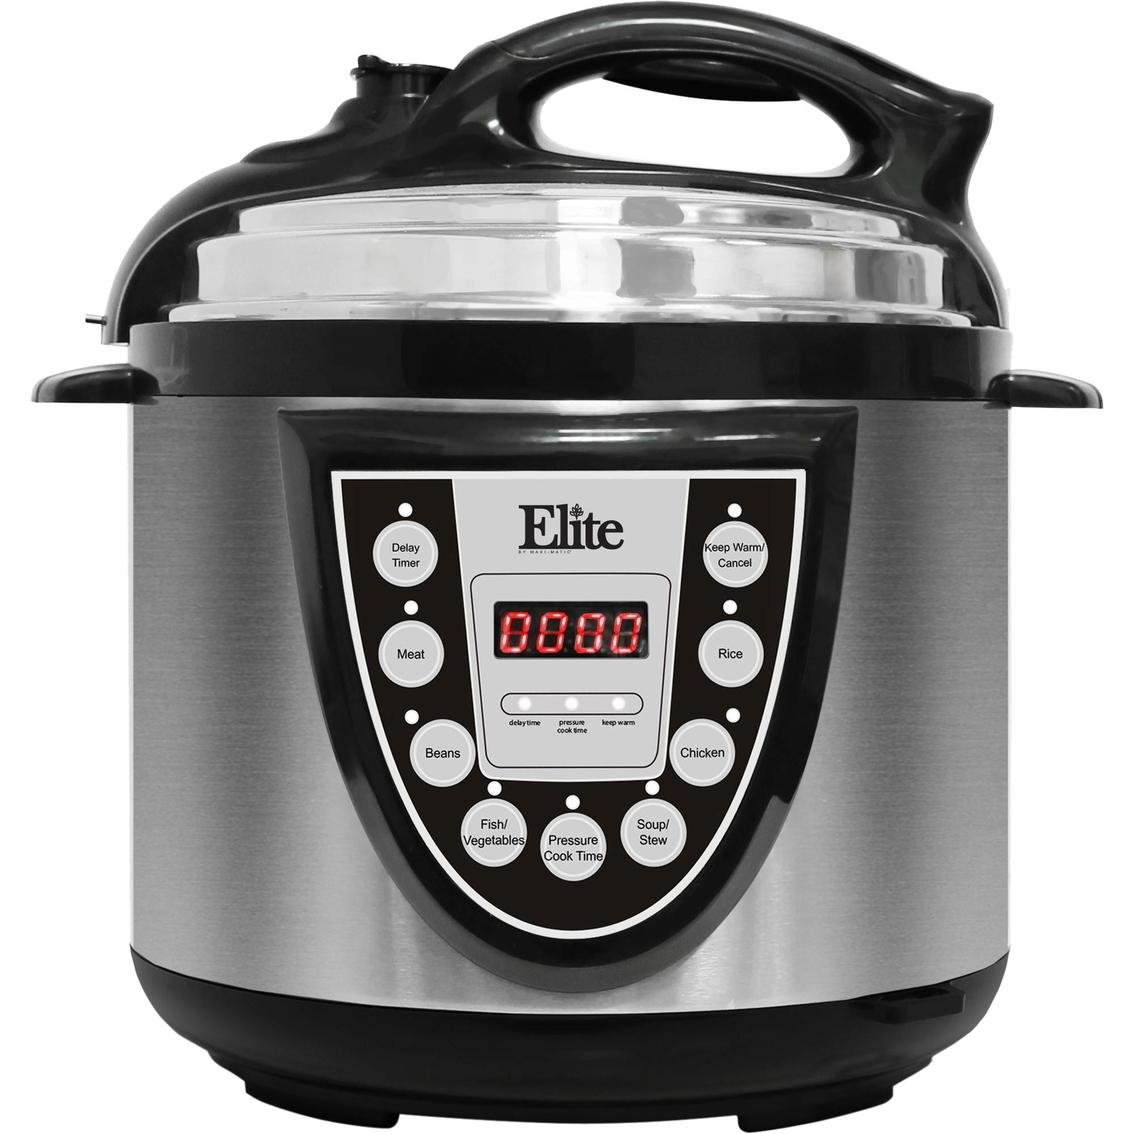 Elite Stainless Steel 4 Qt  Digital Pressure Cooker